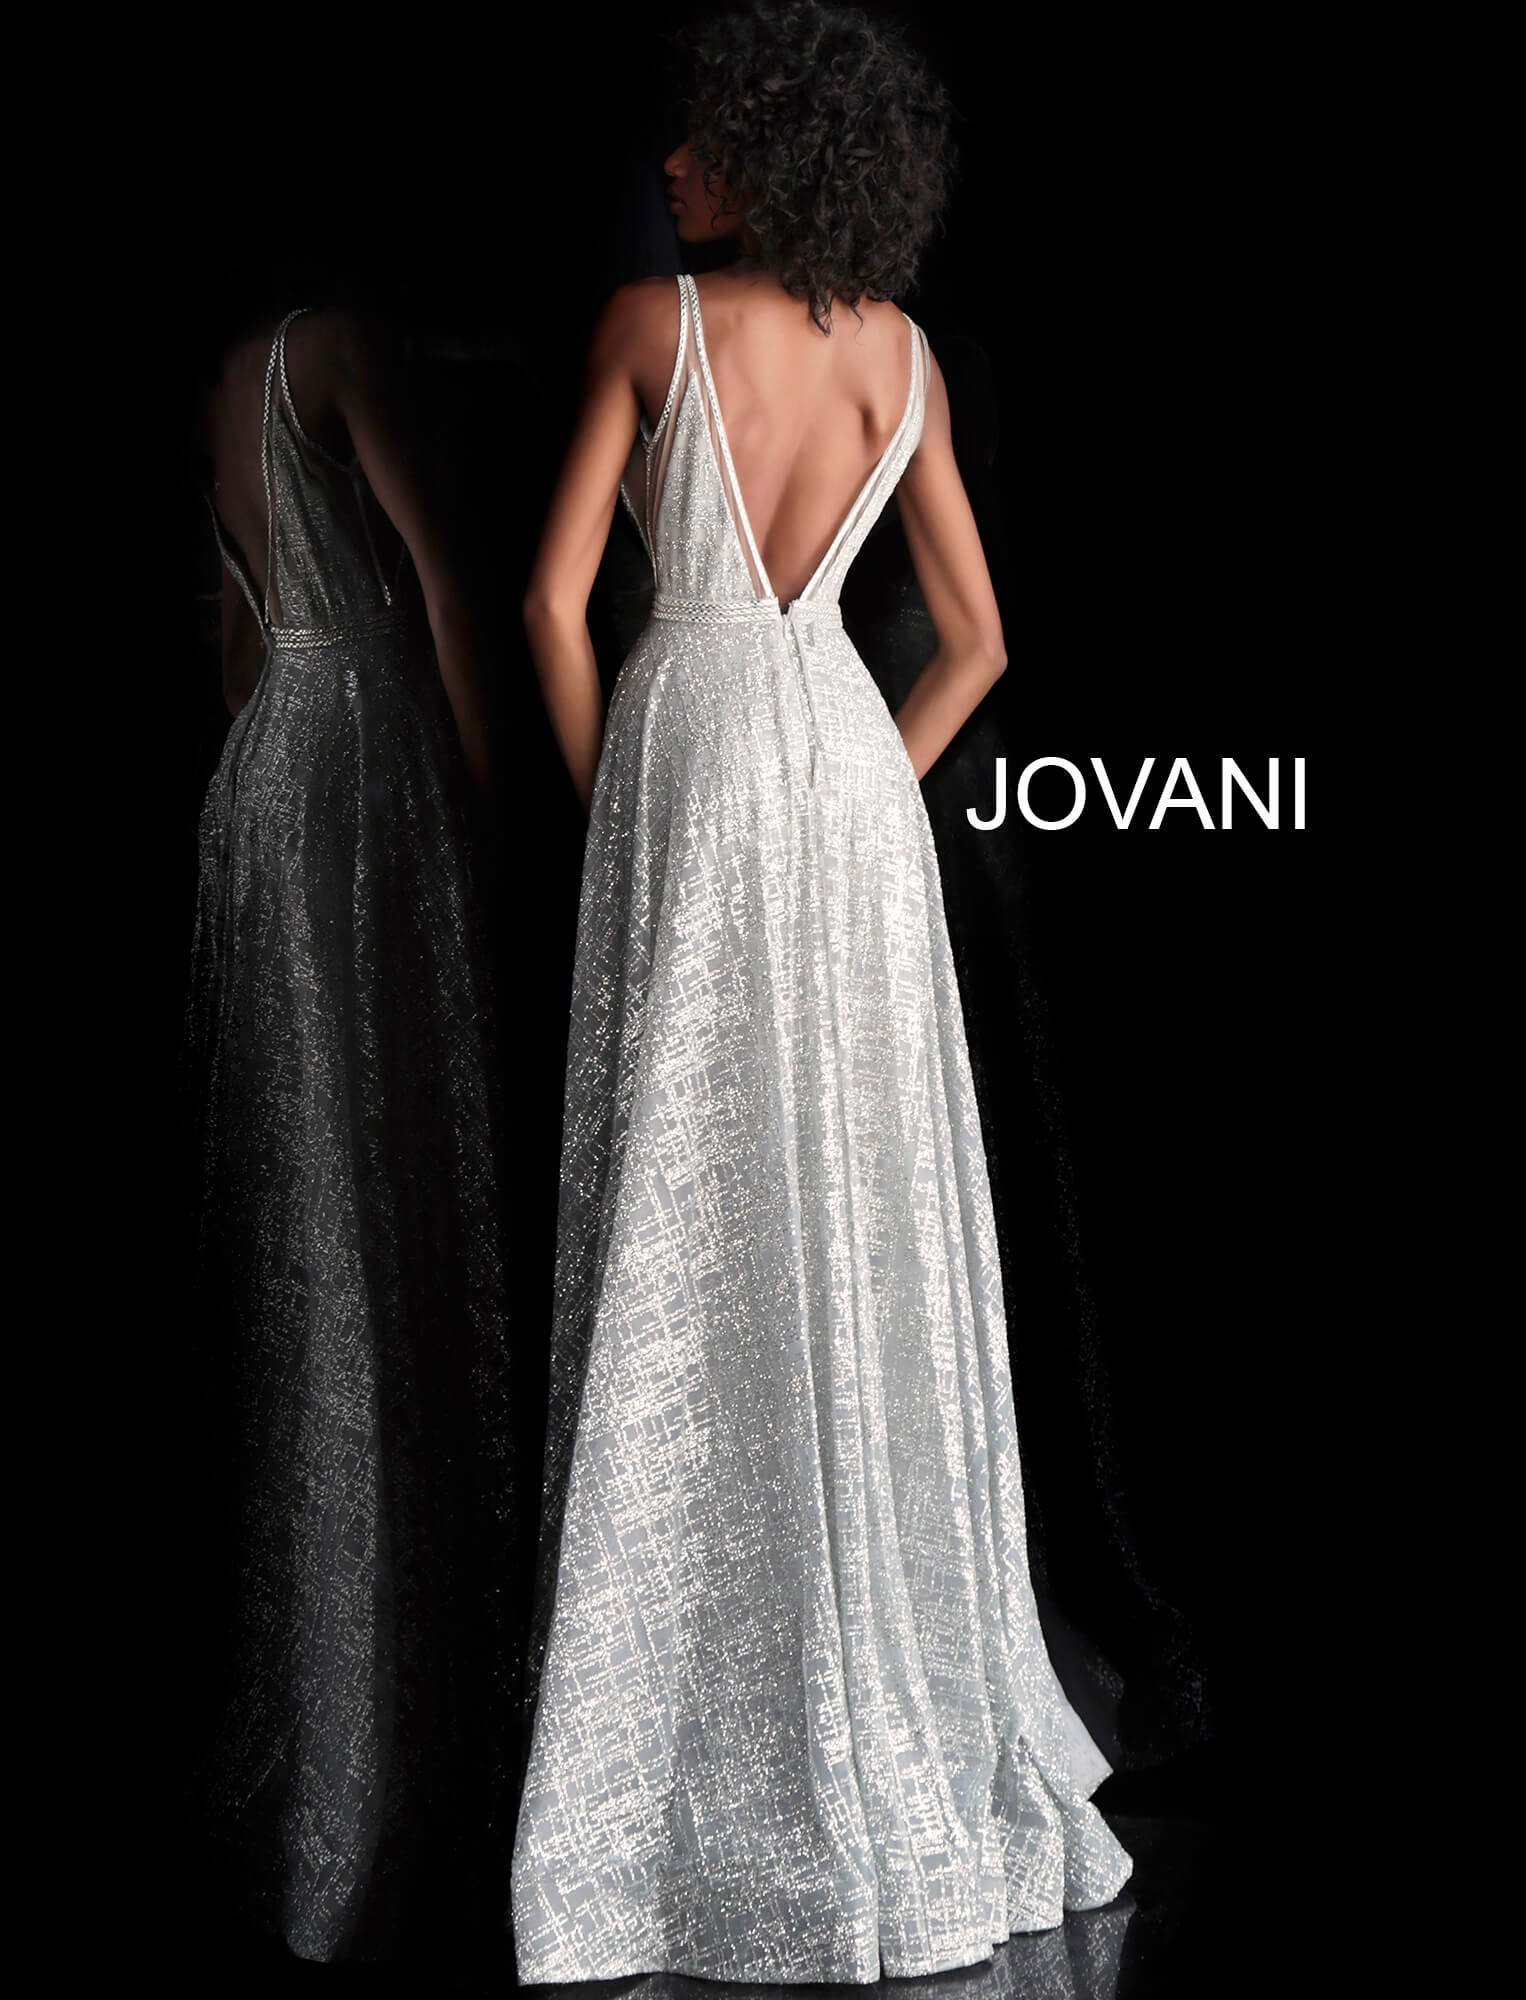 4b4650b4 Jovani 62515 picture 1 · Jovani 62515 picture 2 · Jovani 62515. Glittery  Deep V-Neck ...